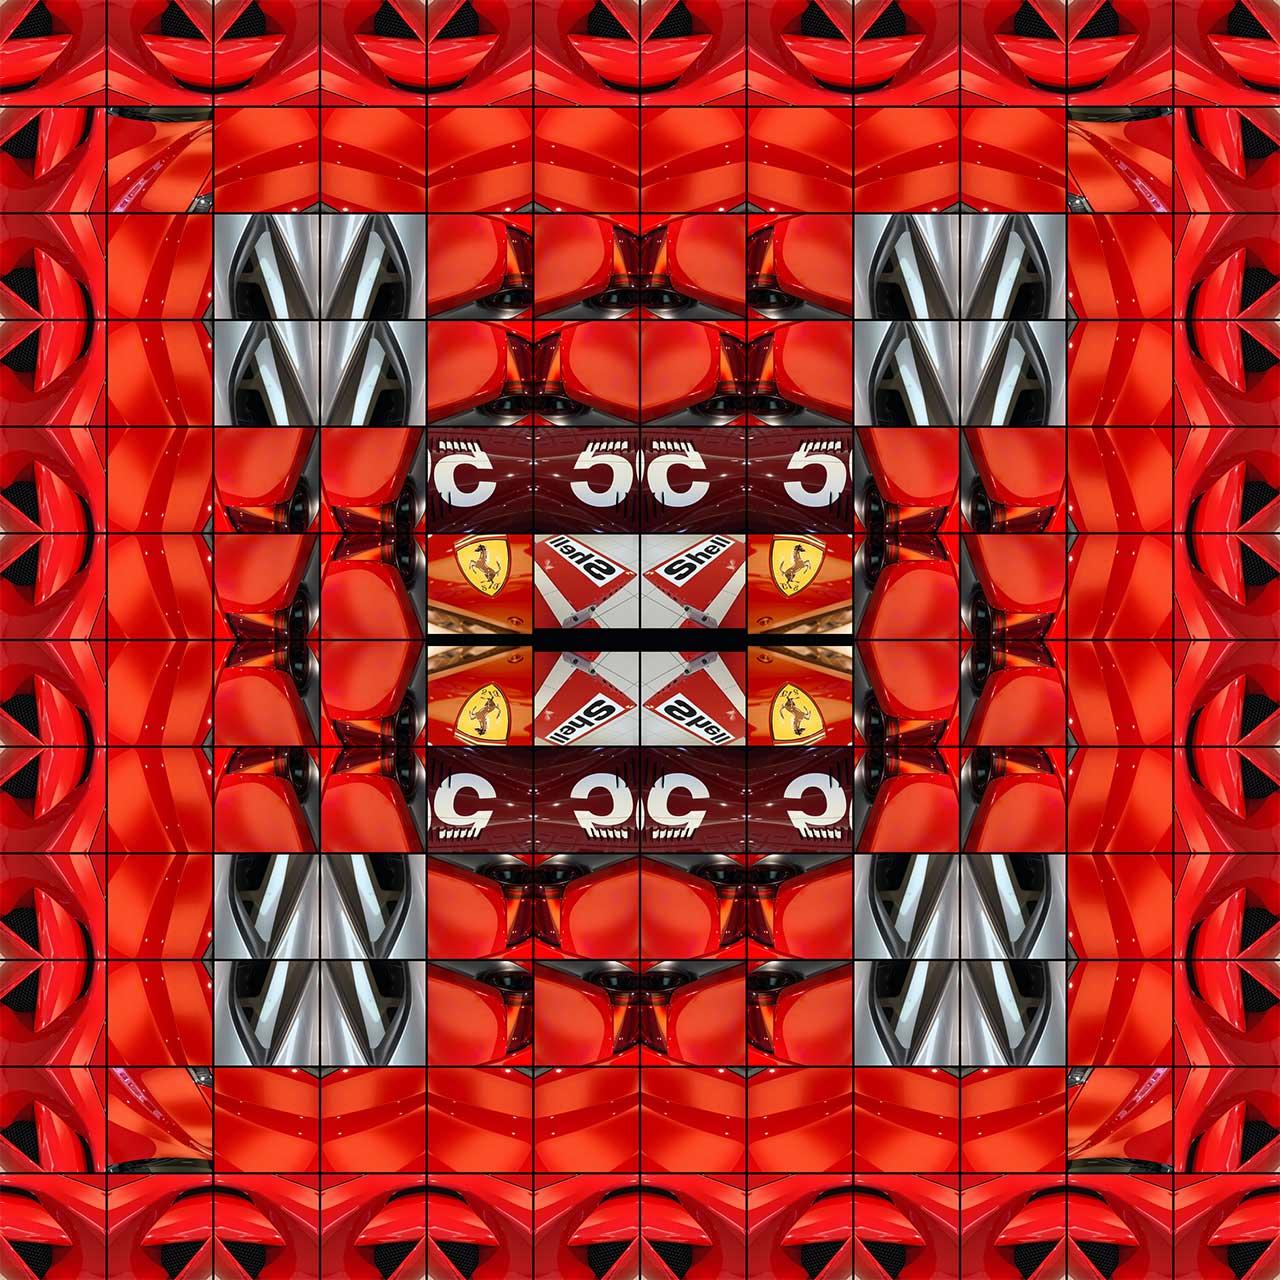 Ferrari F1 Series 2020 Ferrari Red 5 David Wiener Fine Art